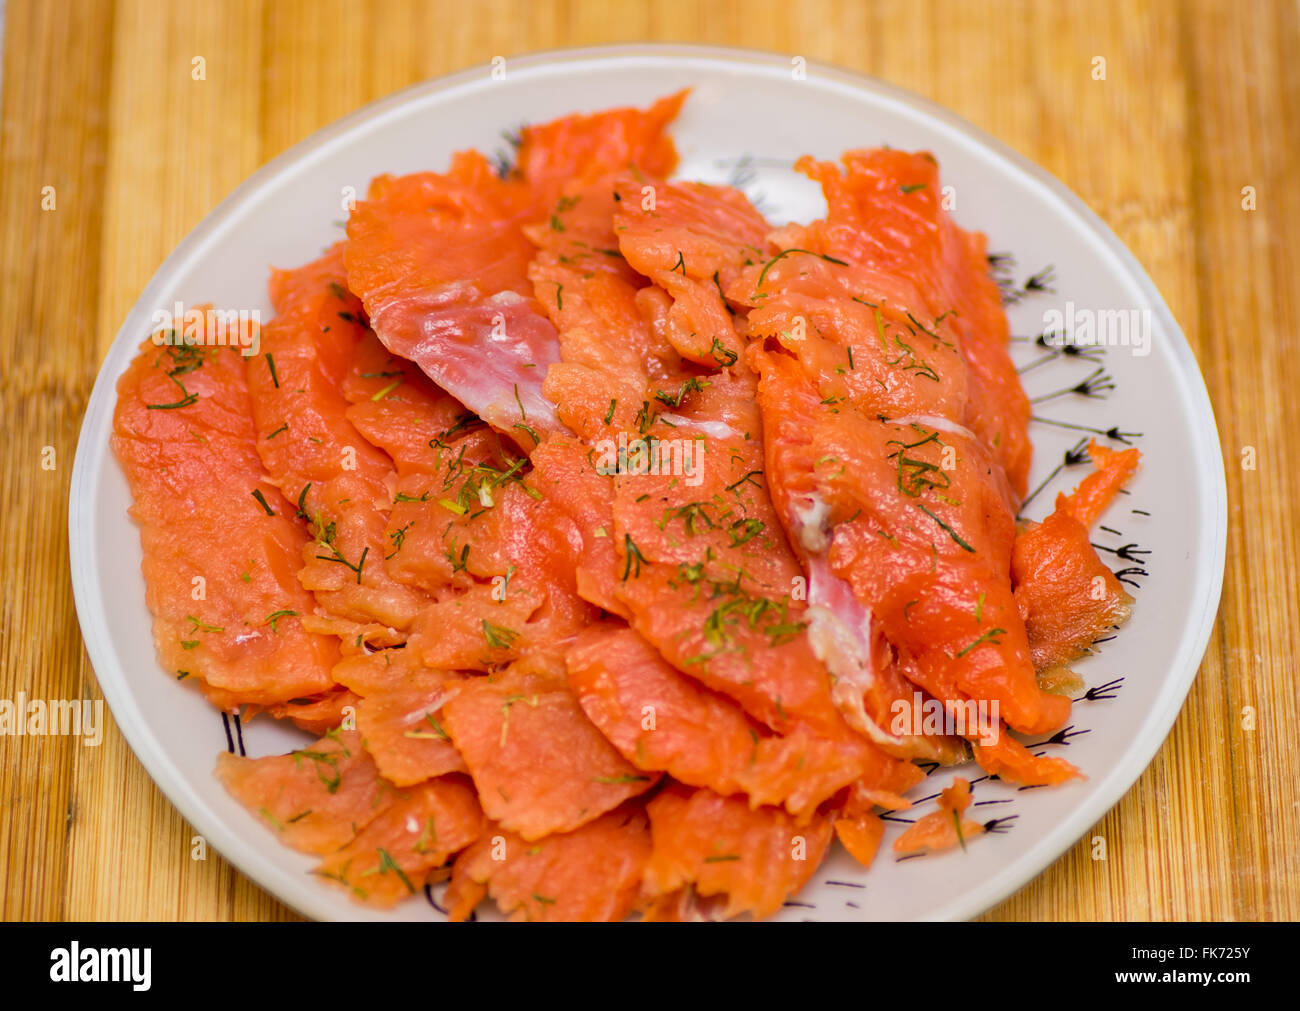 red fish sliced prepared fish food  sashimi - Stock Image